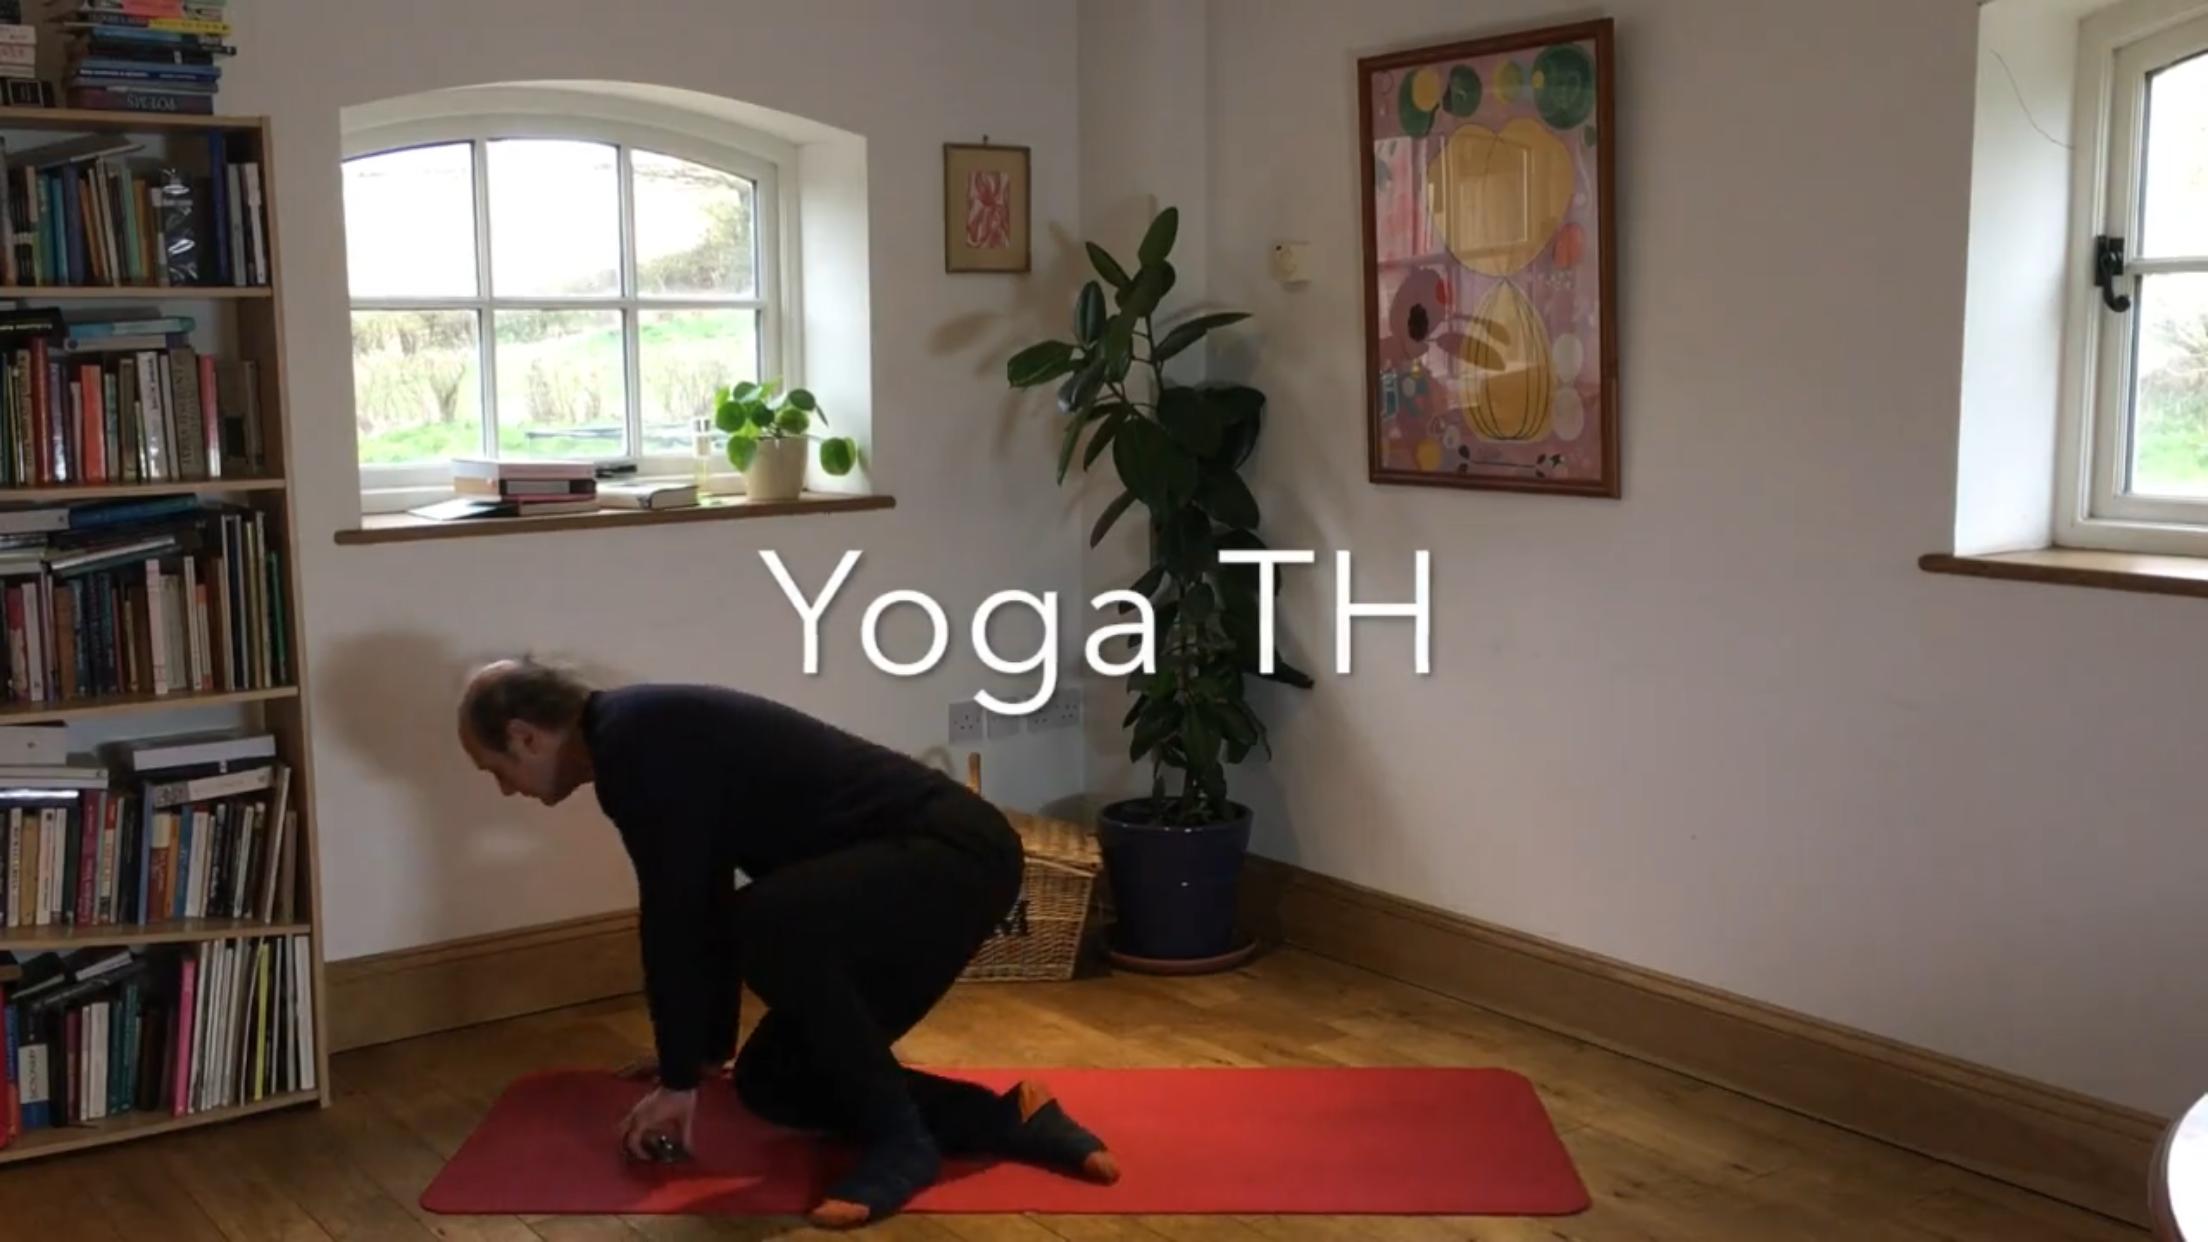 Yoga 'TH' - 1hr 6mins